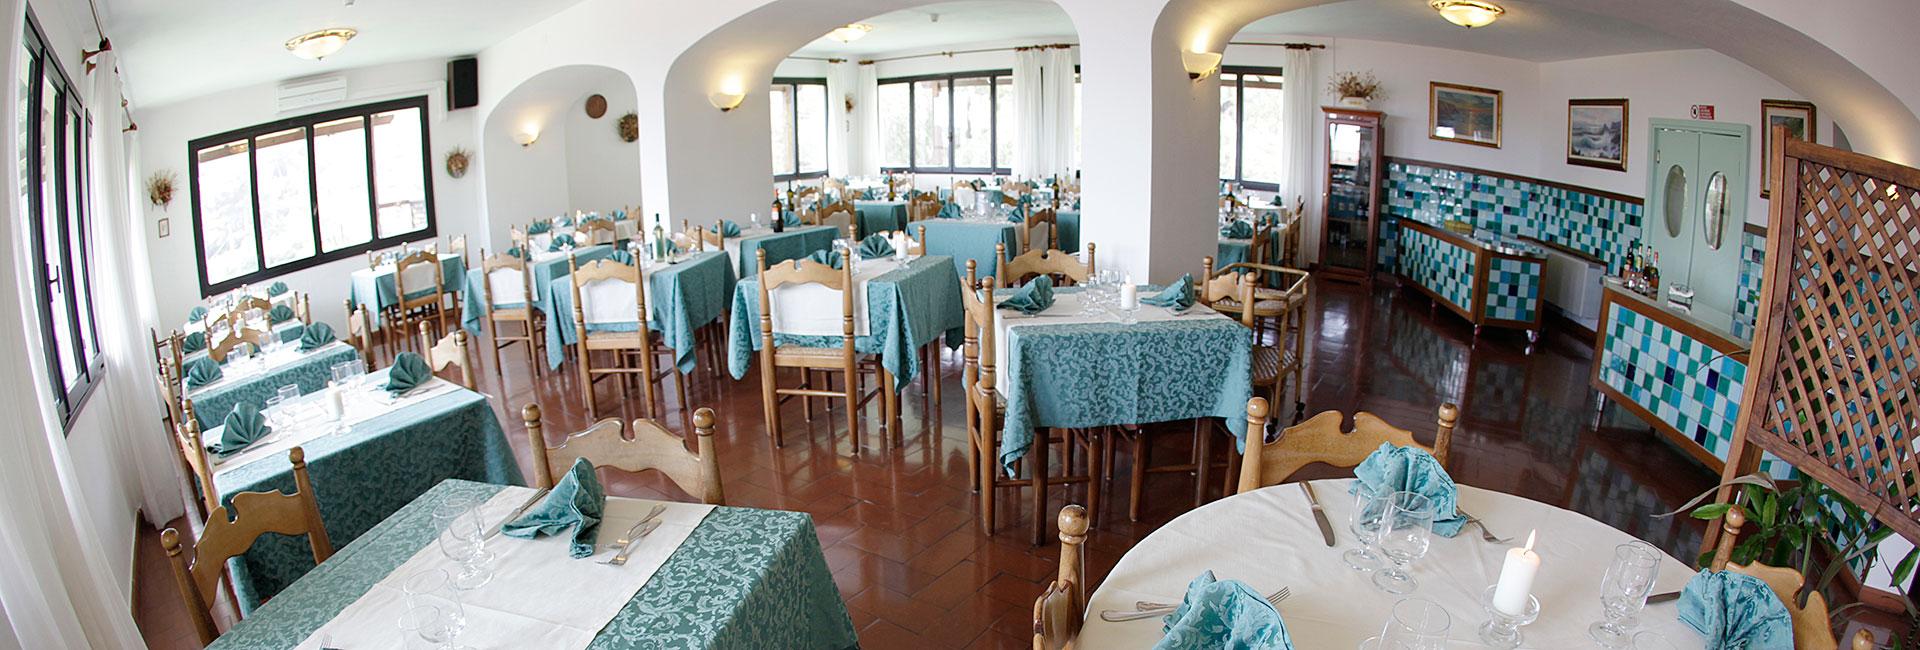 Restaurant Hôtel Galli